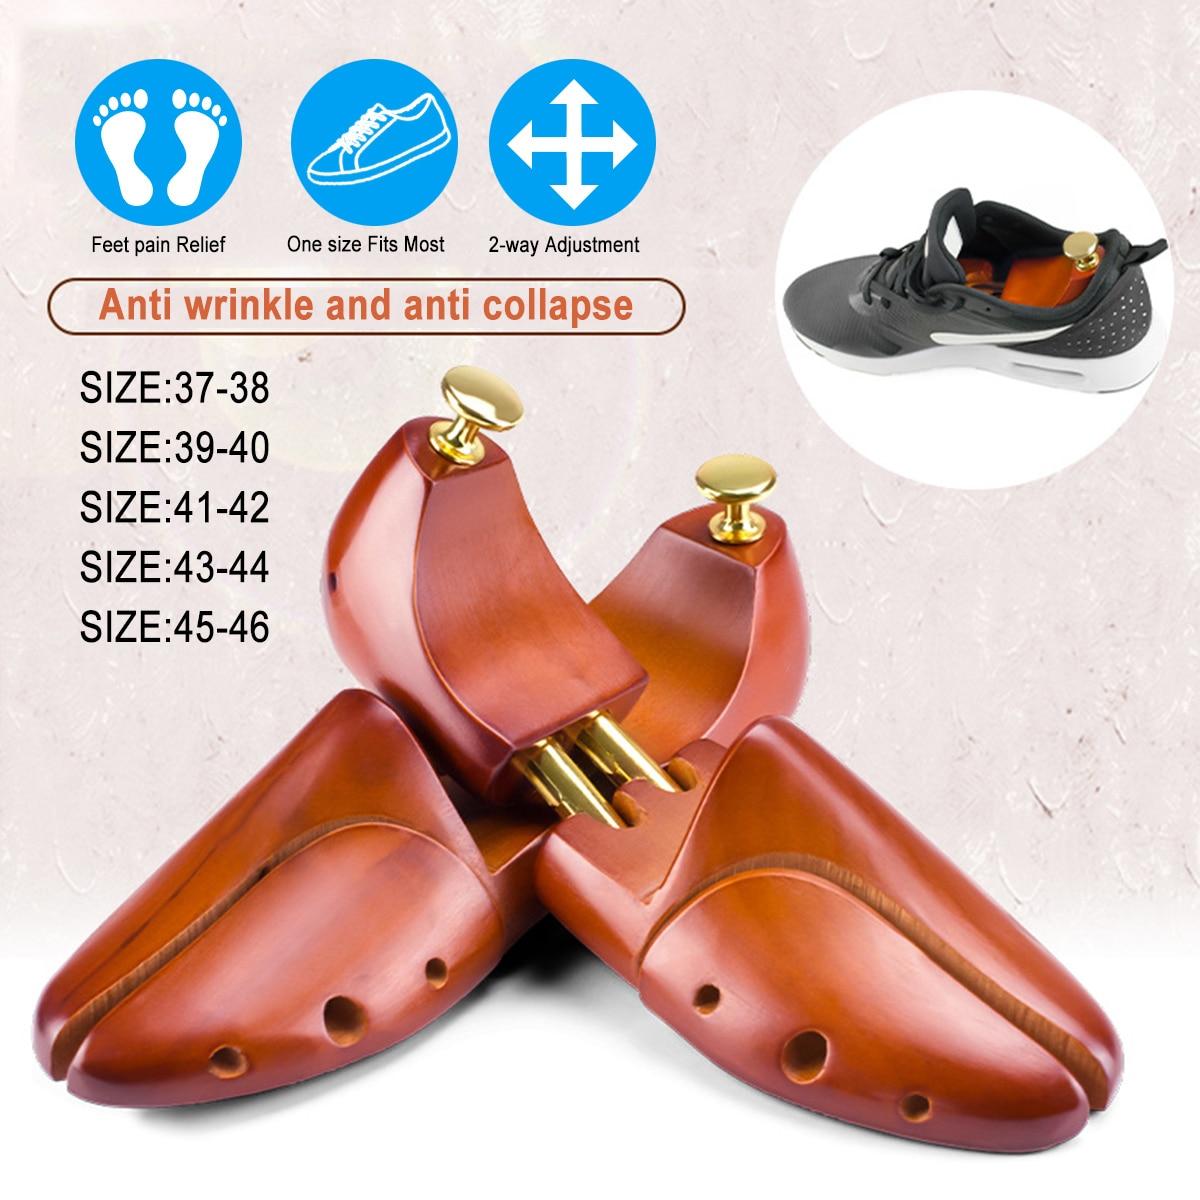 1Pair Shoe Stretcher Wooden Shoes Tree Rack Wood Adjustable Flats Pumps Boots Heels Expander Trees Size 37-48 Man Women